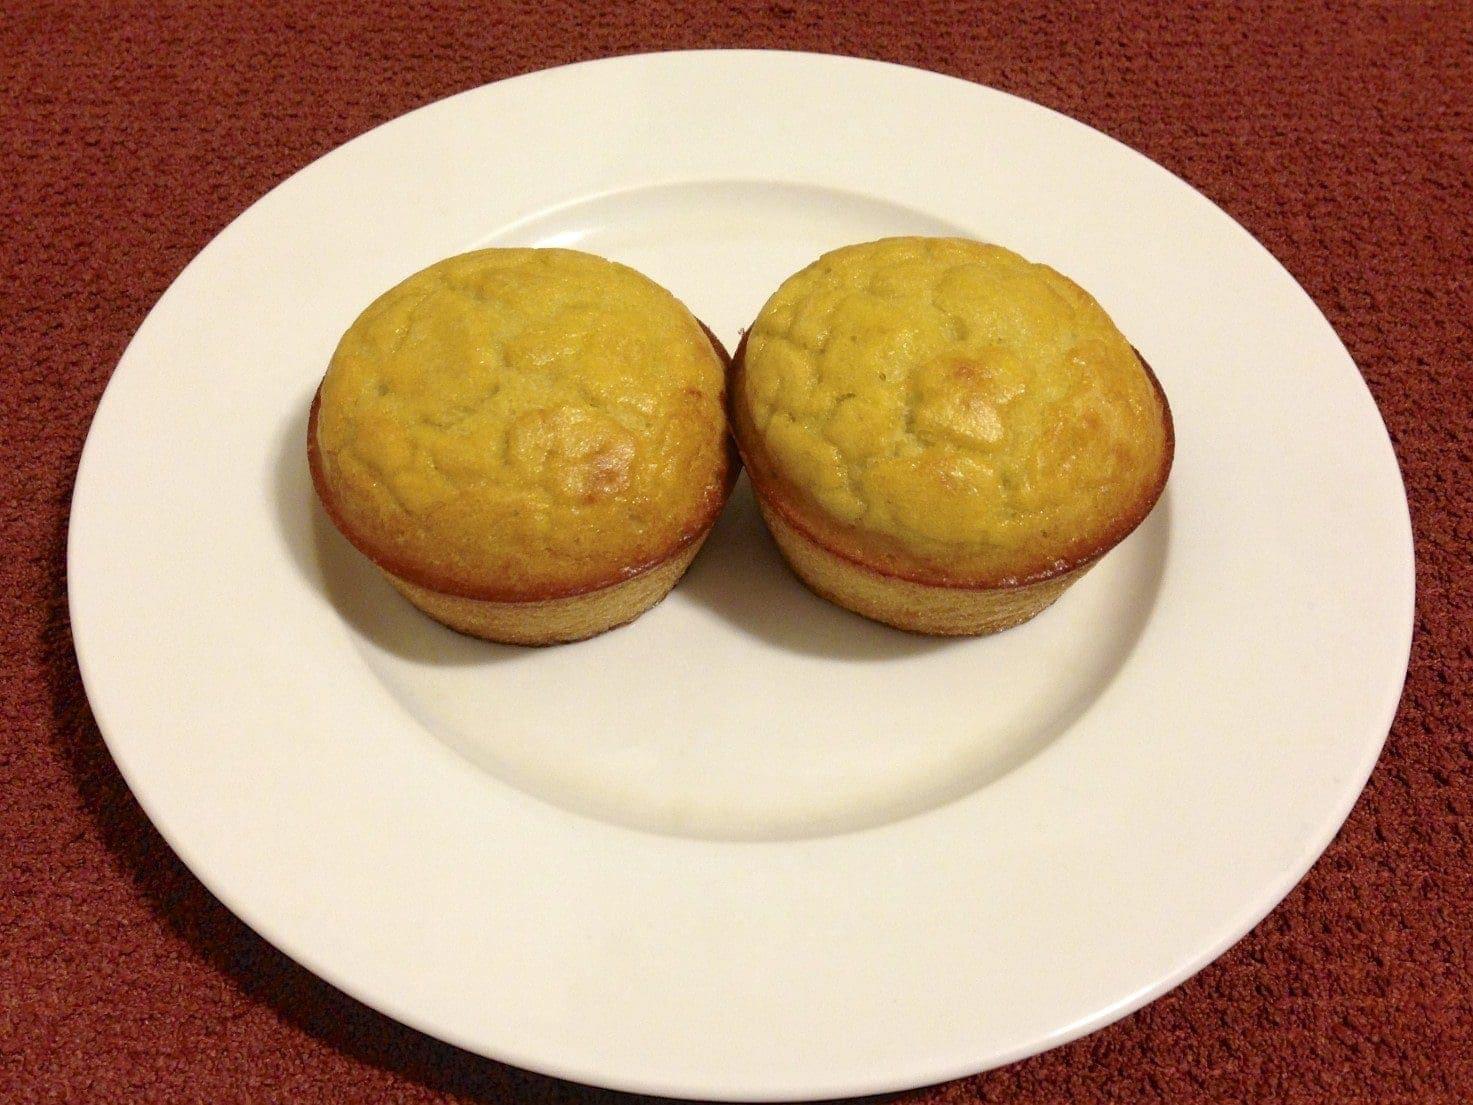 paleo coconut flour orange muffin